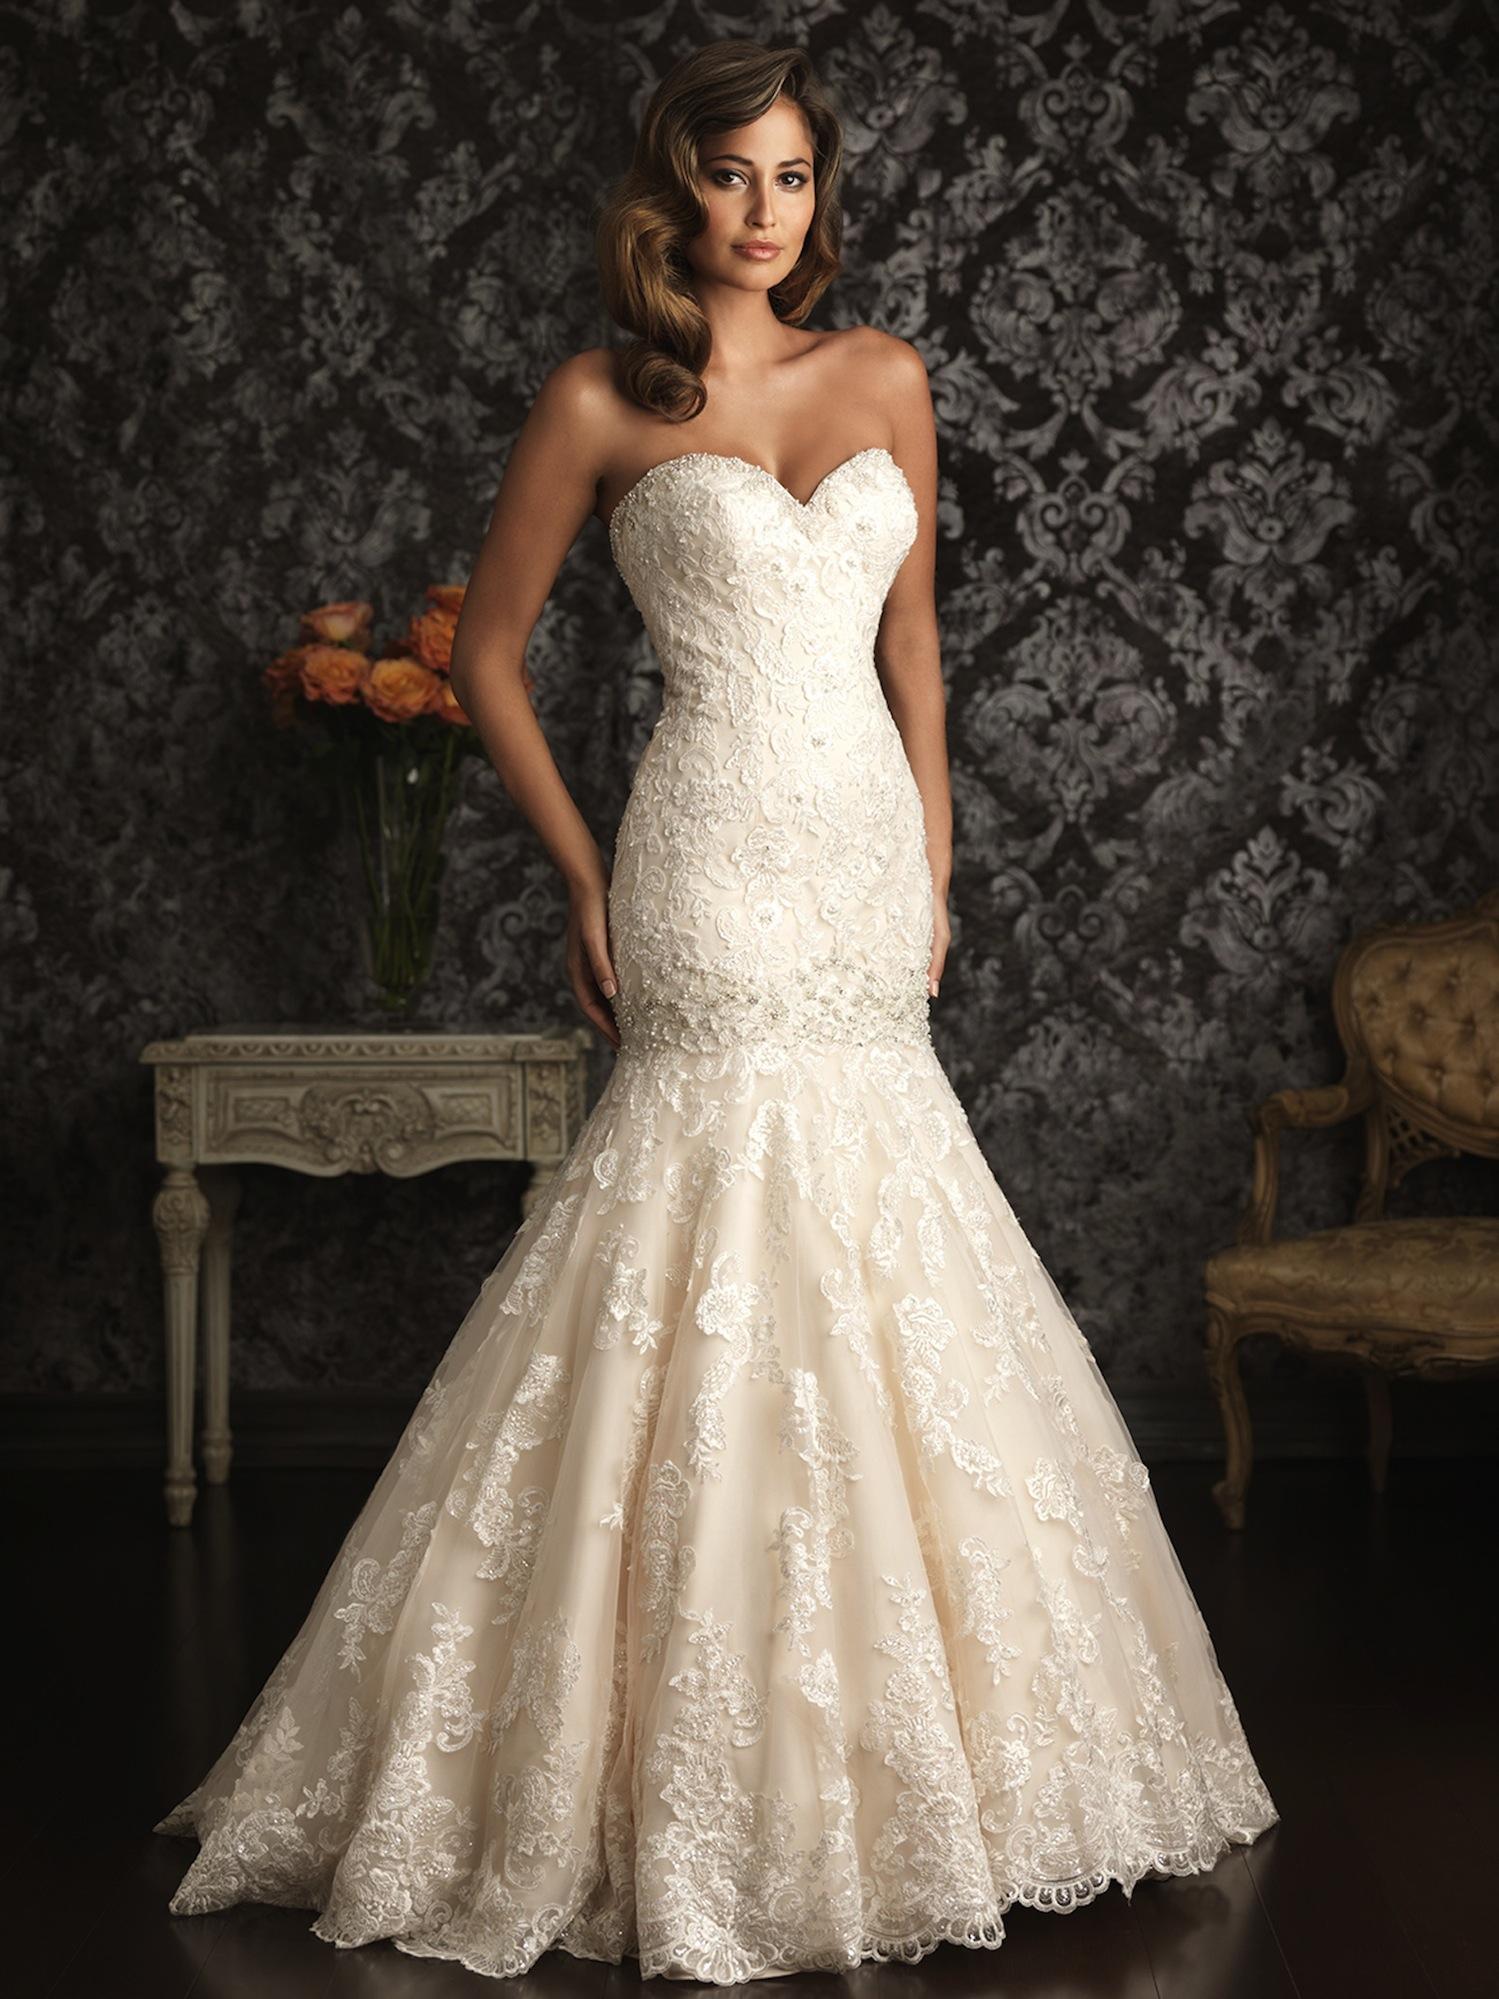 Allure Wedding Gowns 007 - Allure Wedding Gowns